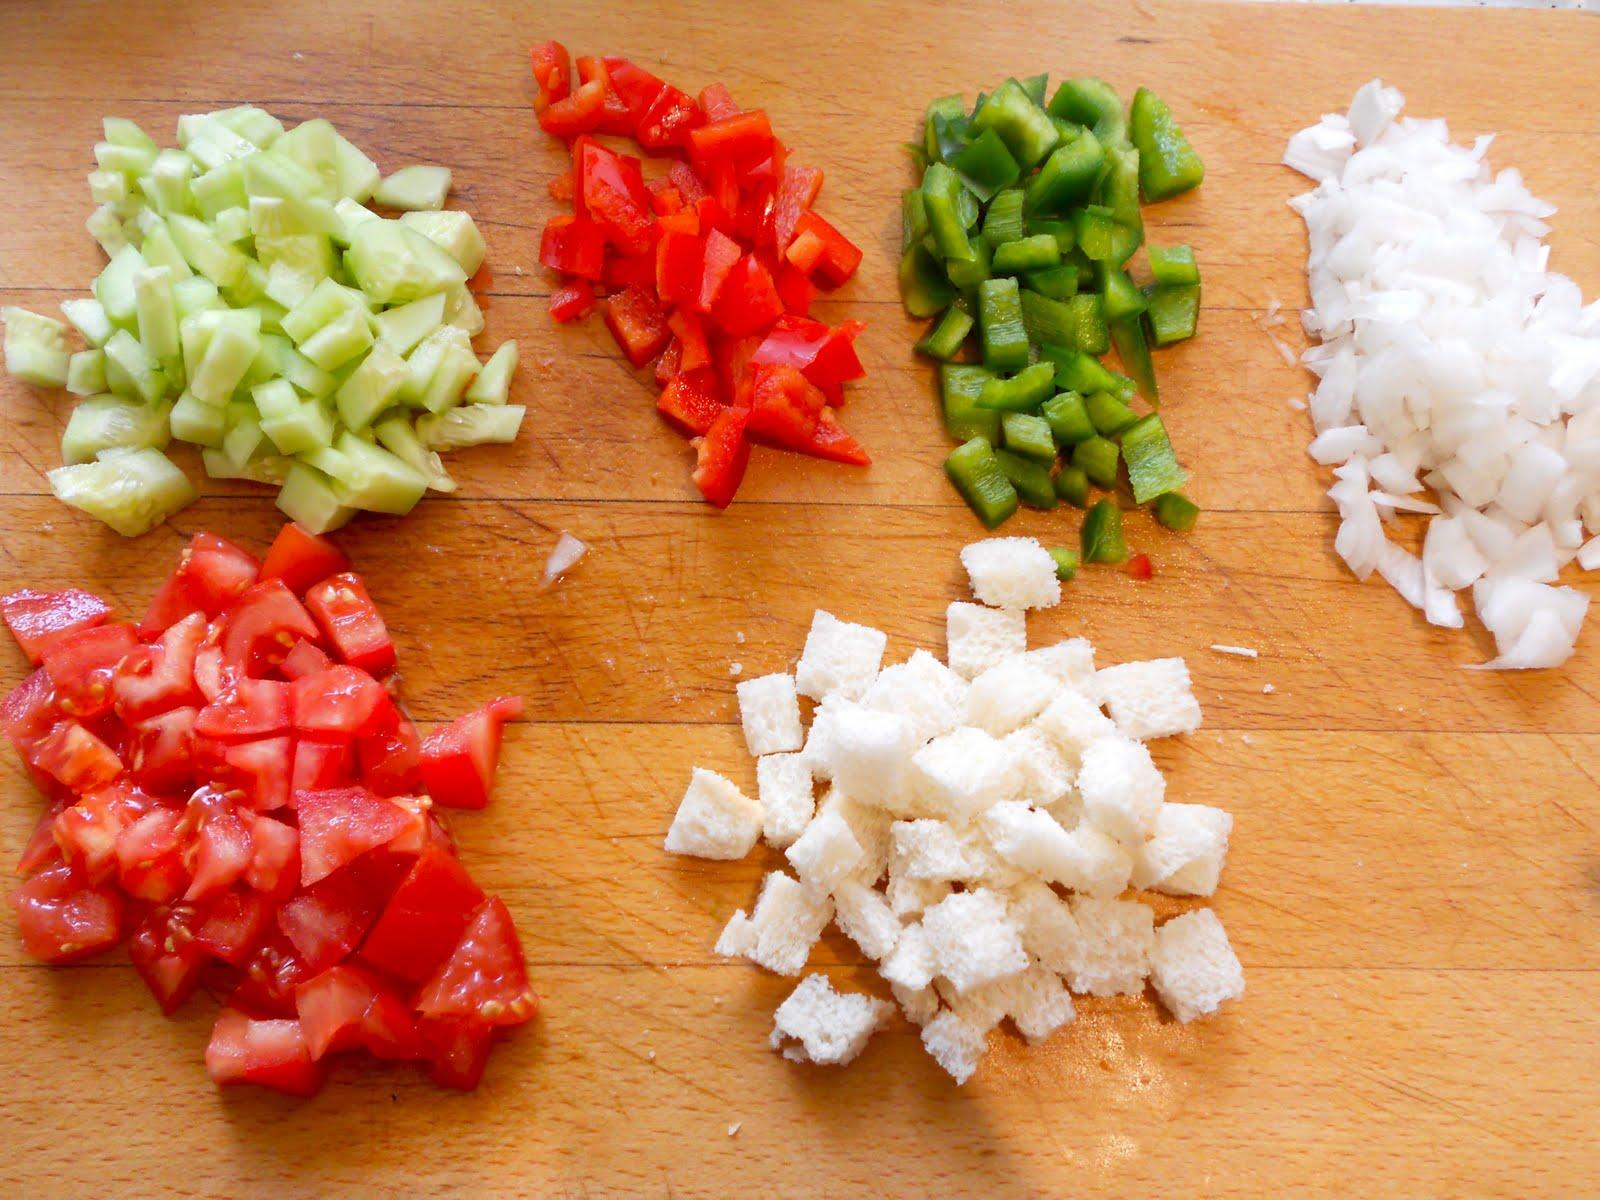 Peter pepper tipos de corte for Cortes de verduras gastronomia pdf